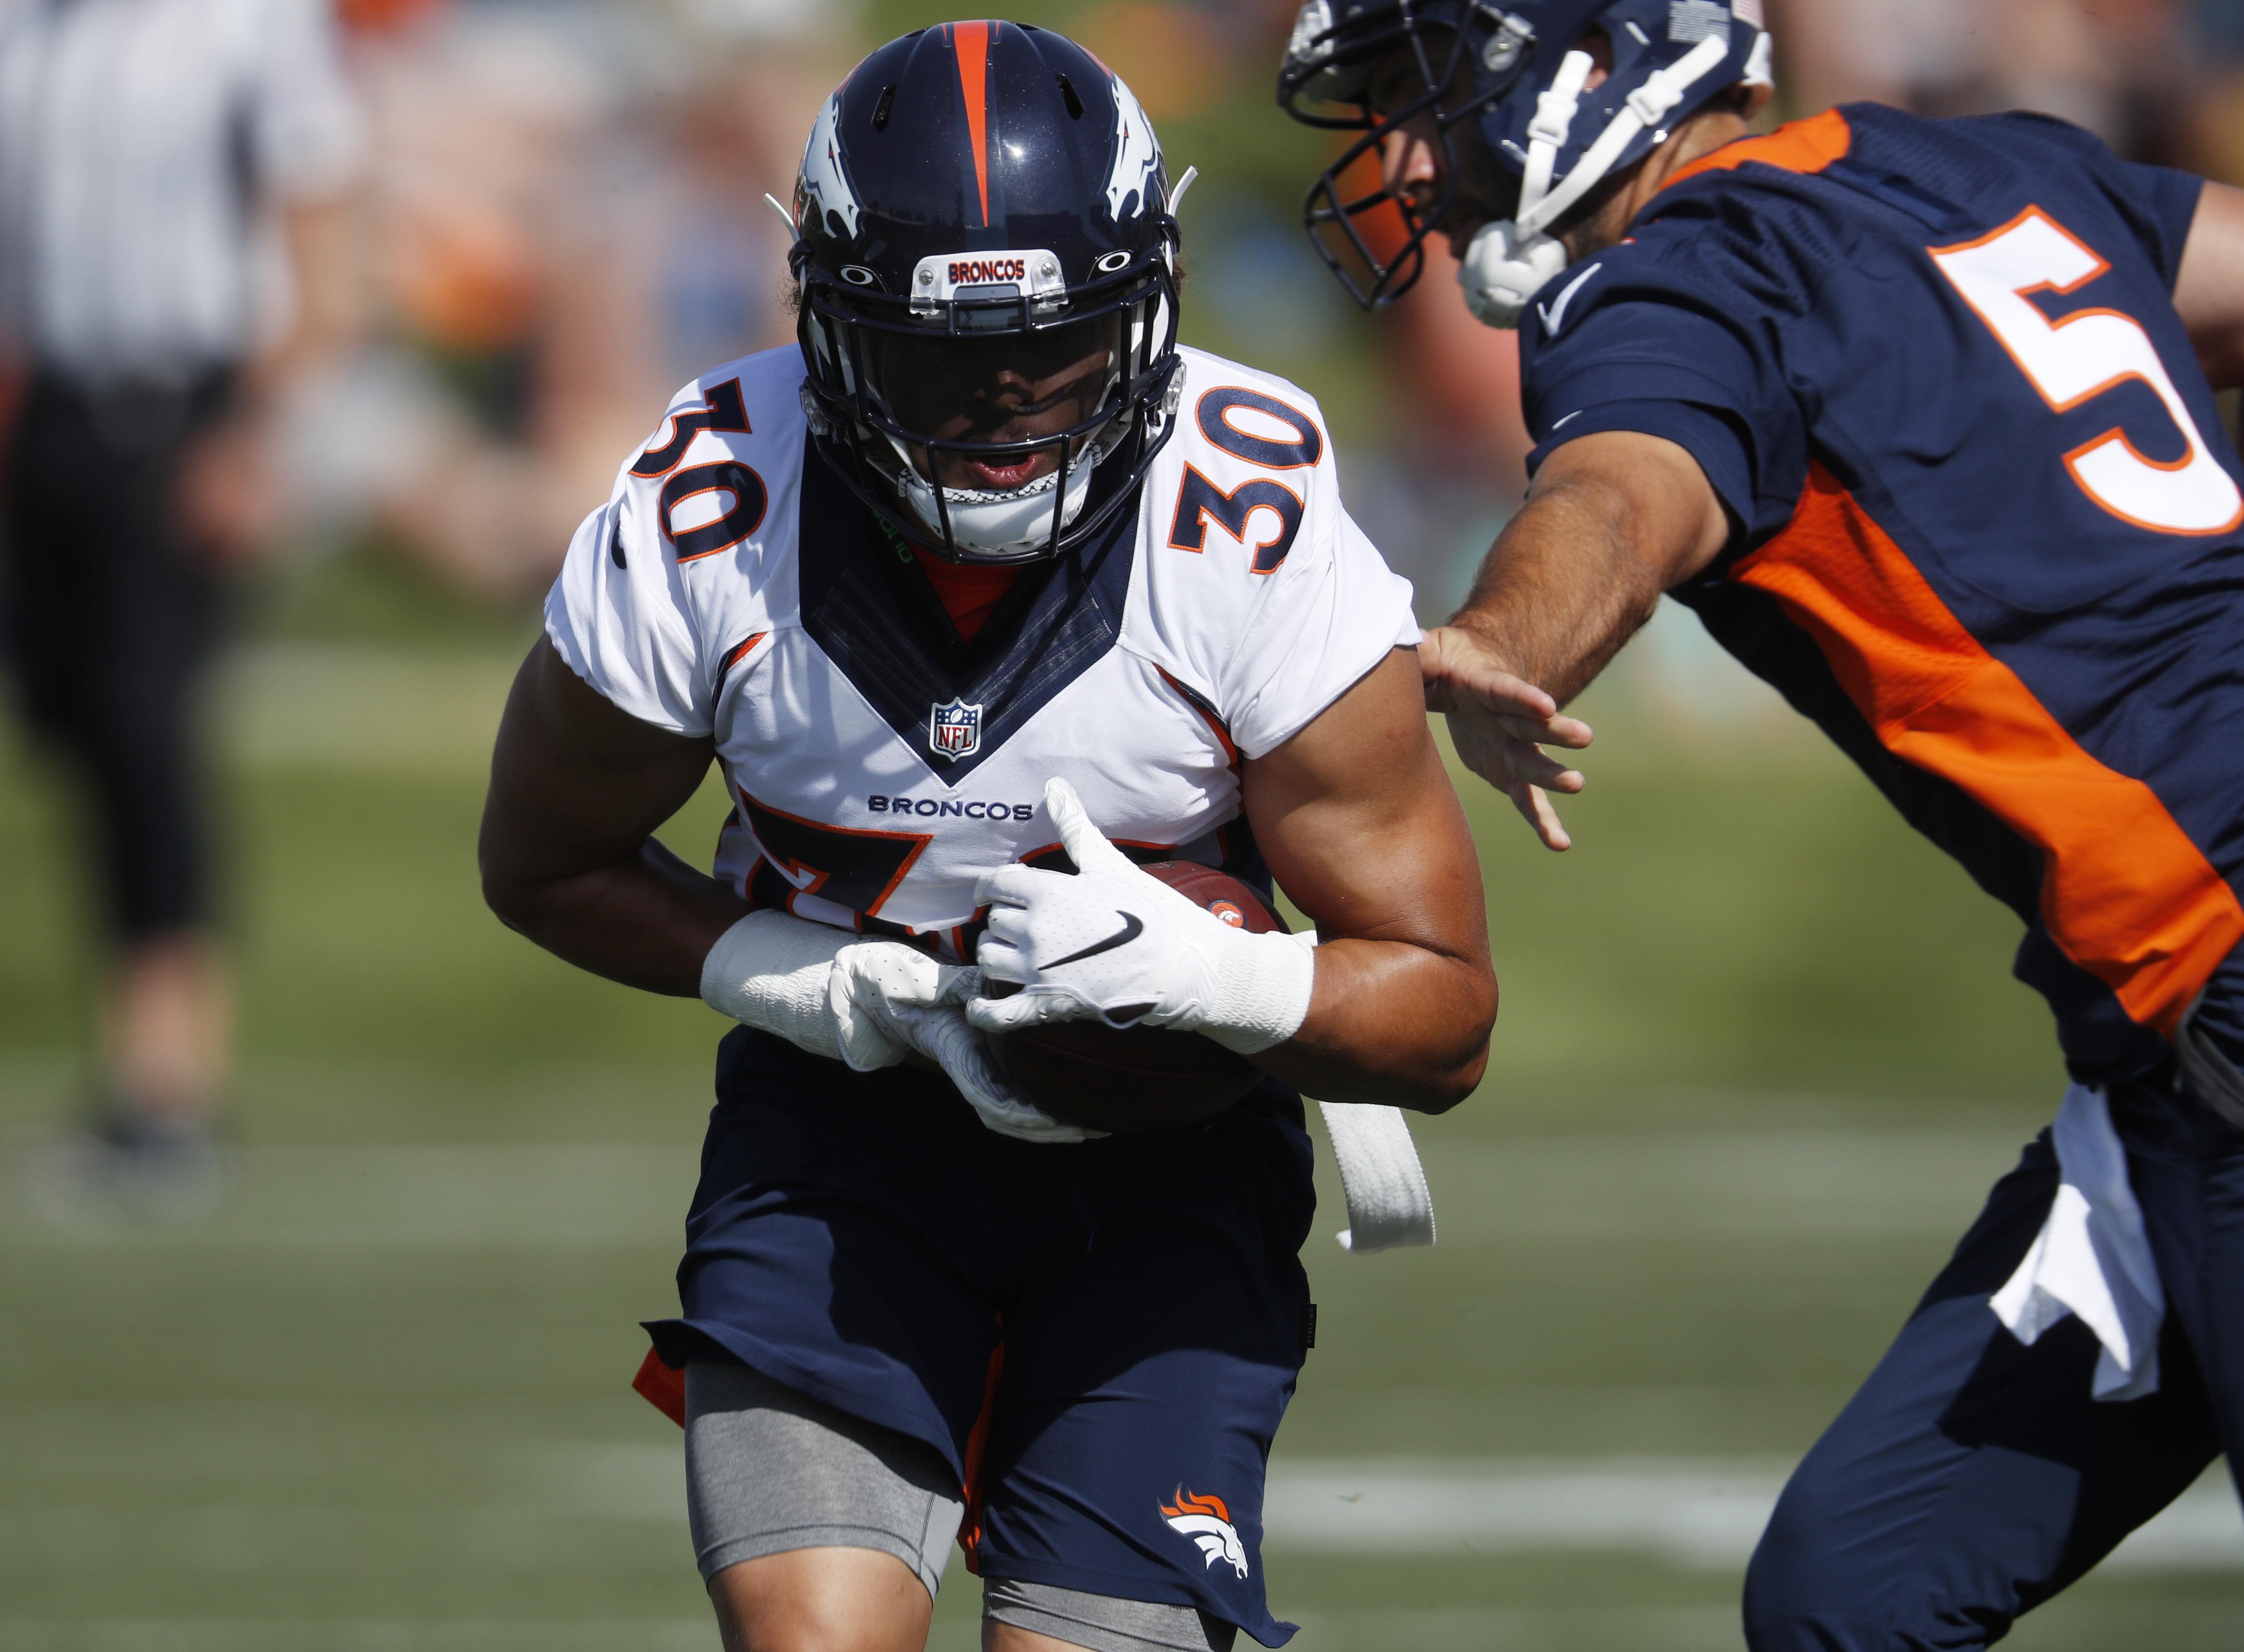 Sanders, Lindsay shine, Davis hurt at Broncos camp opener